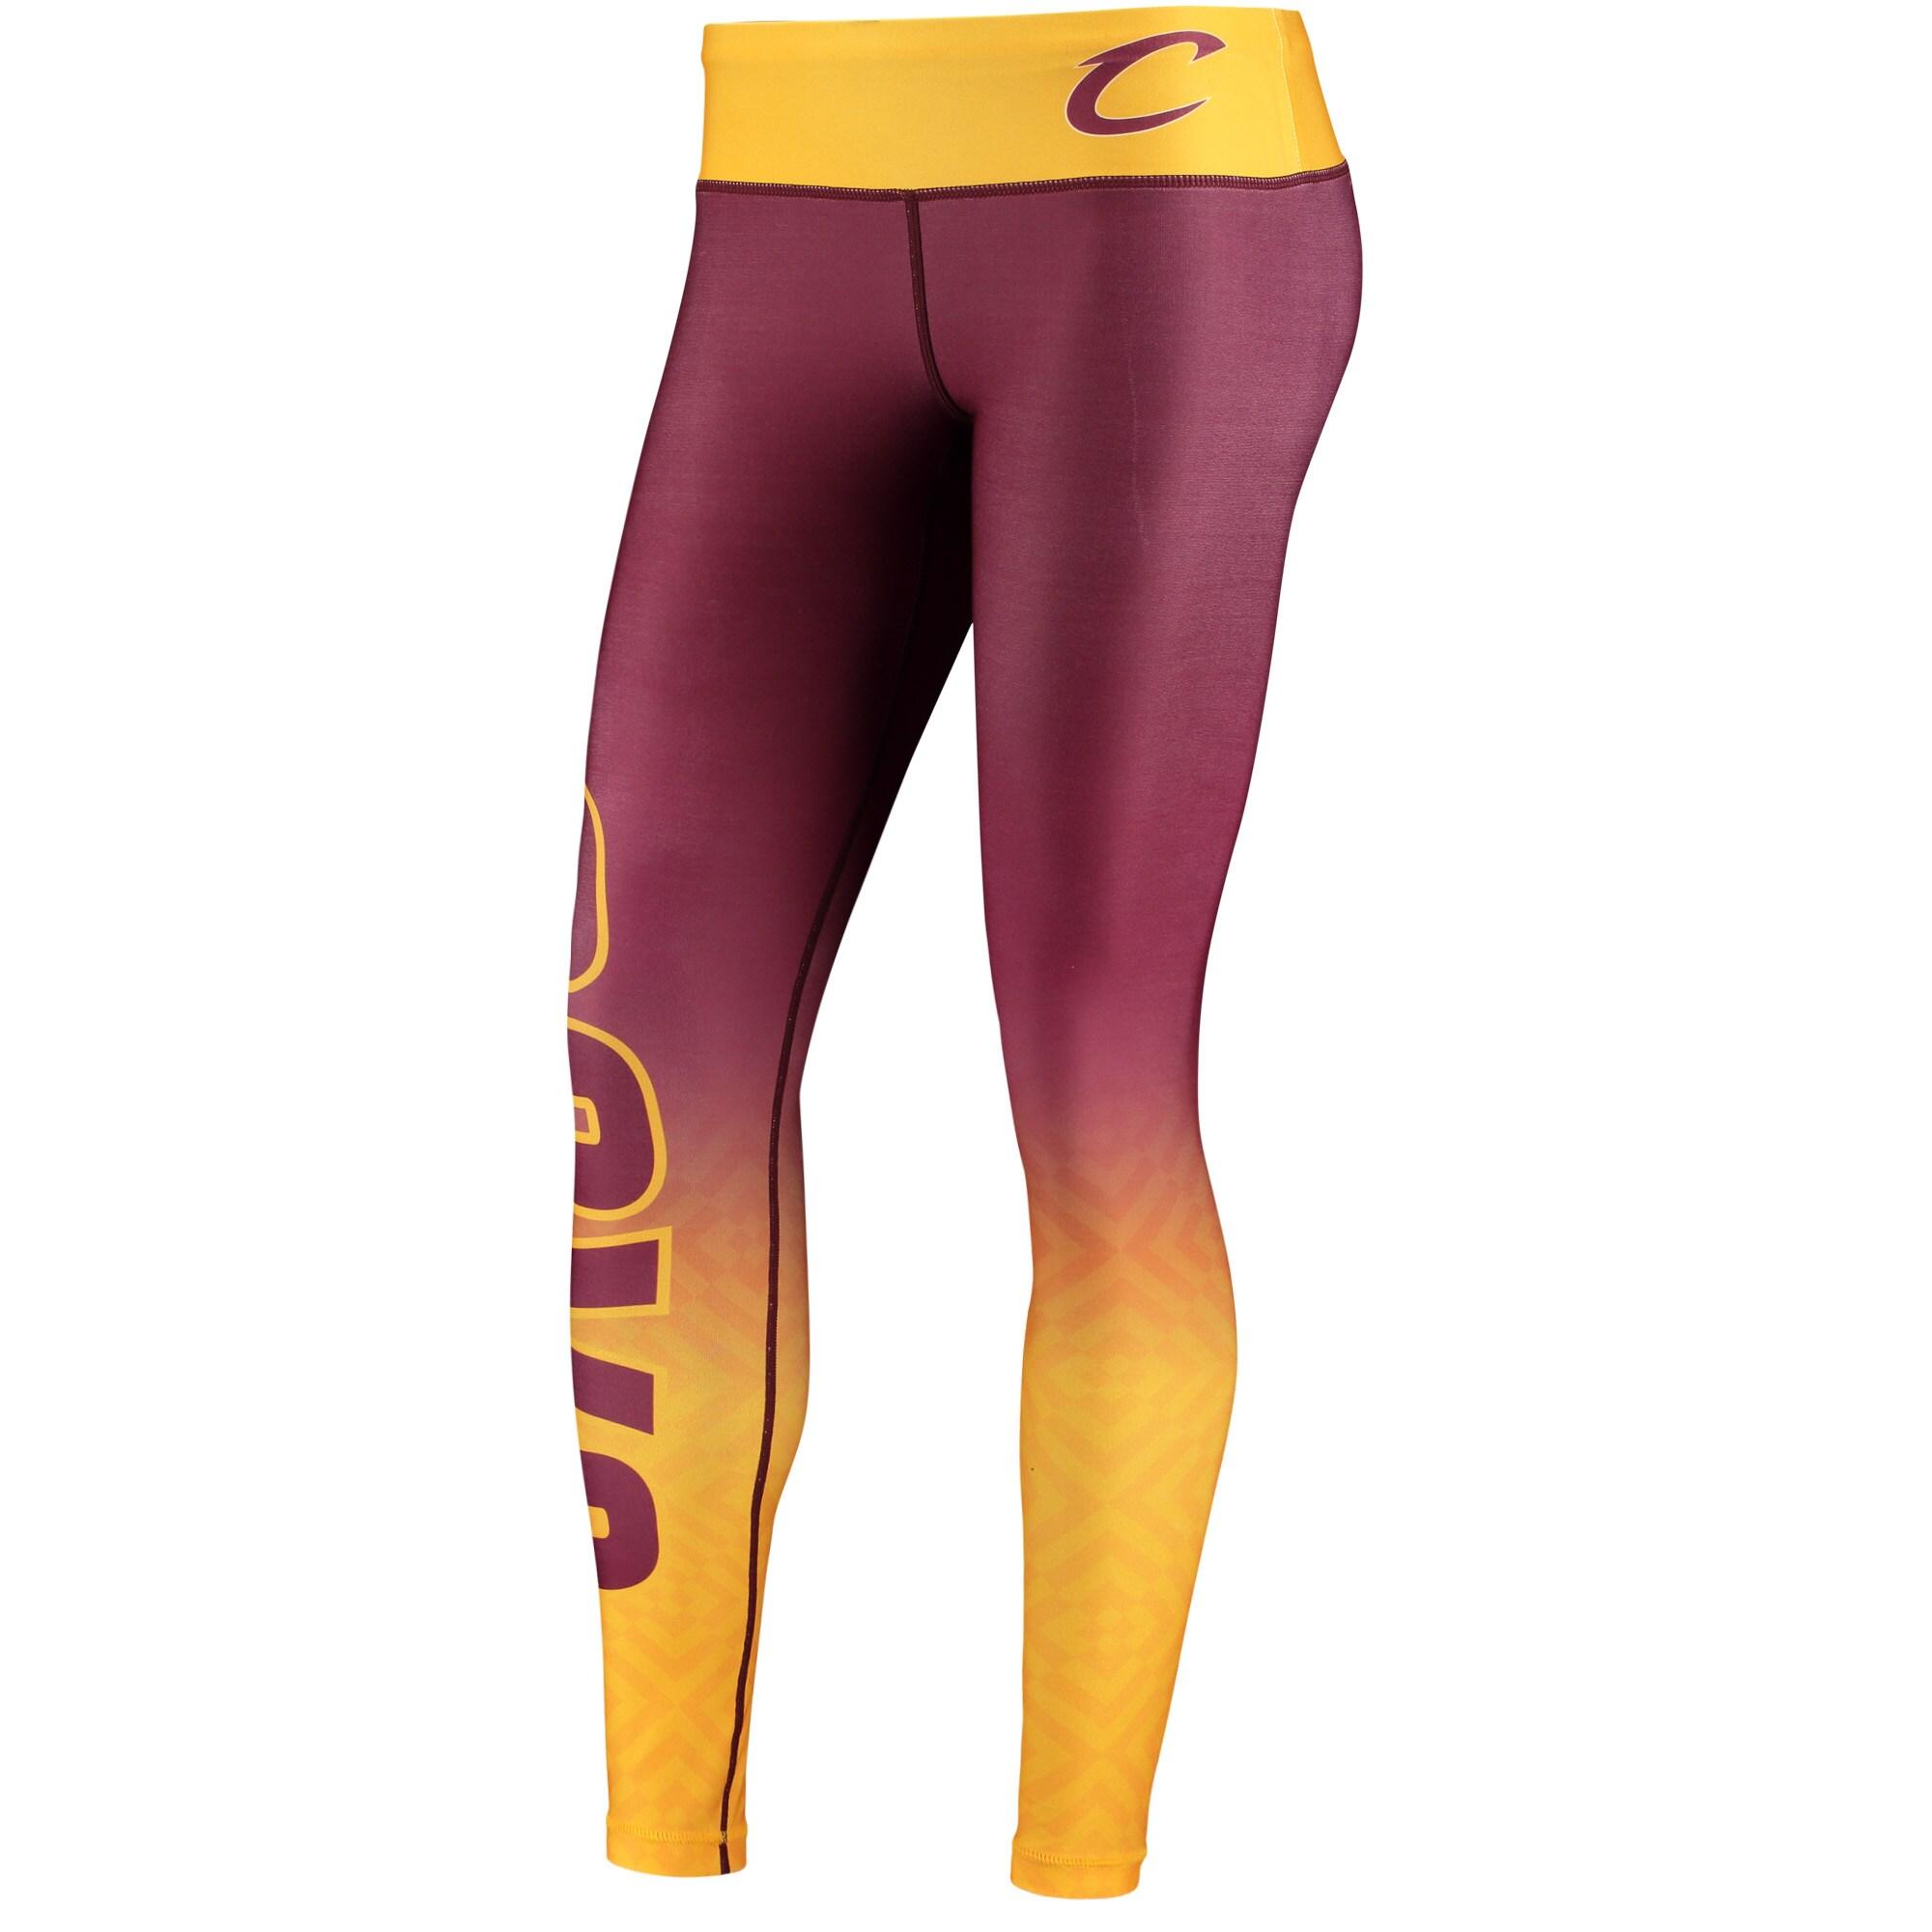 Cleveland Cavaliers Women's Gradient Leggings - Maroon